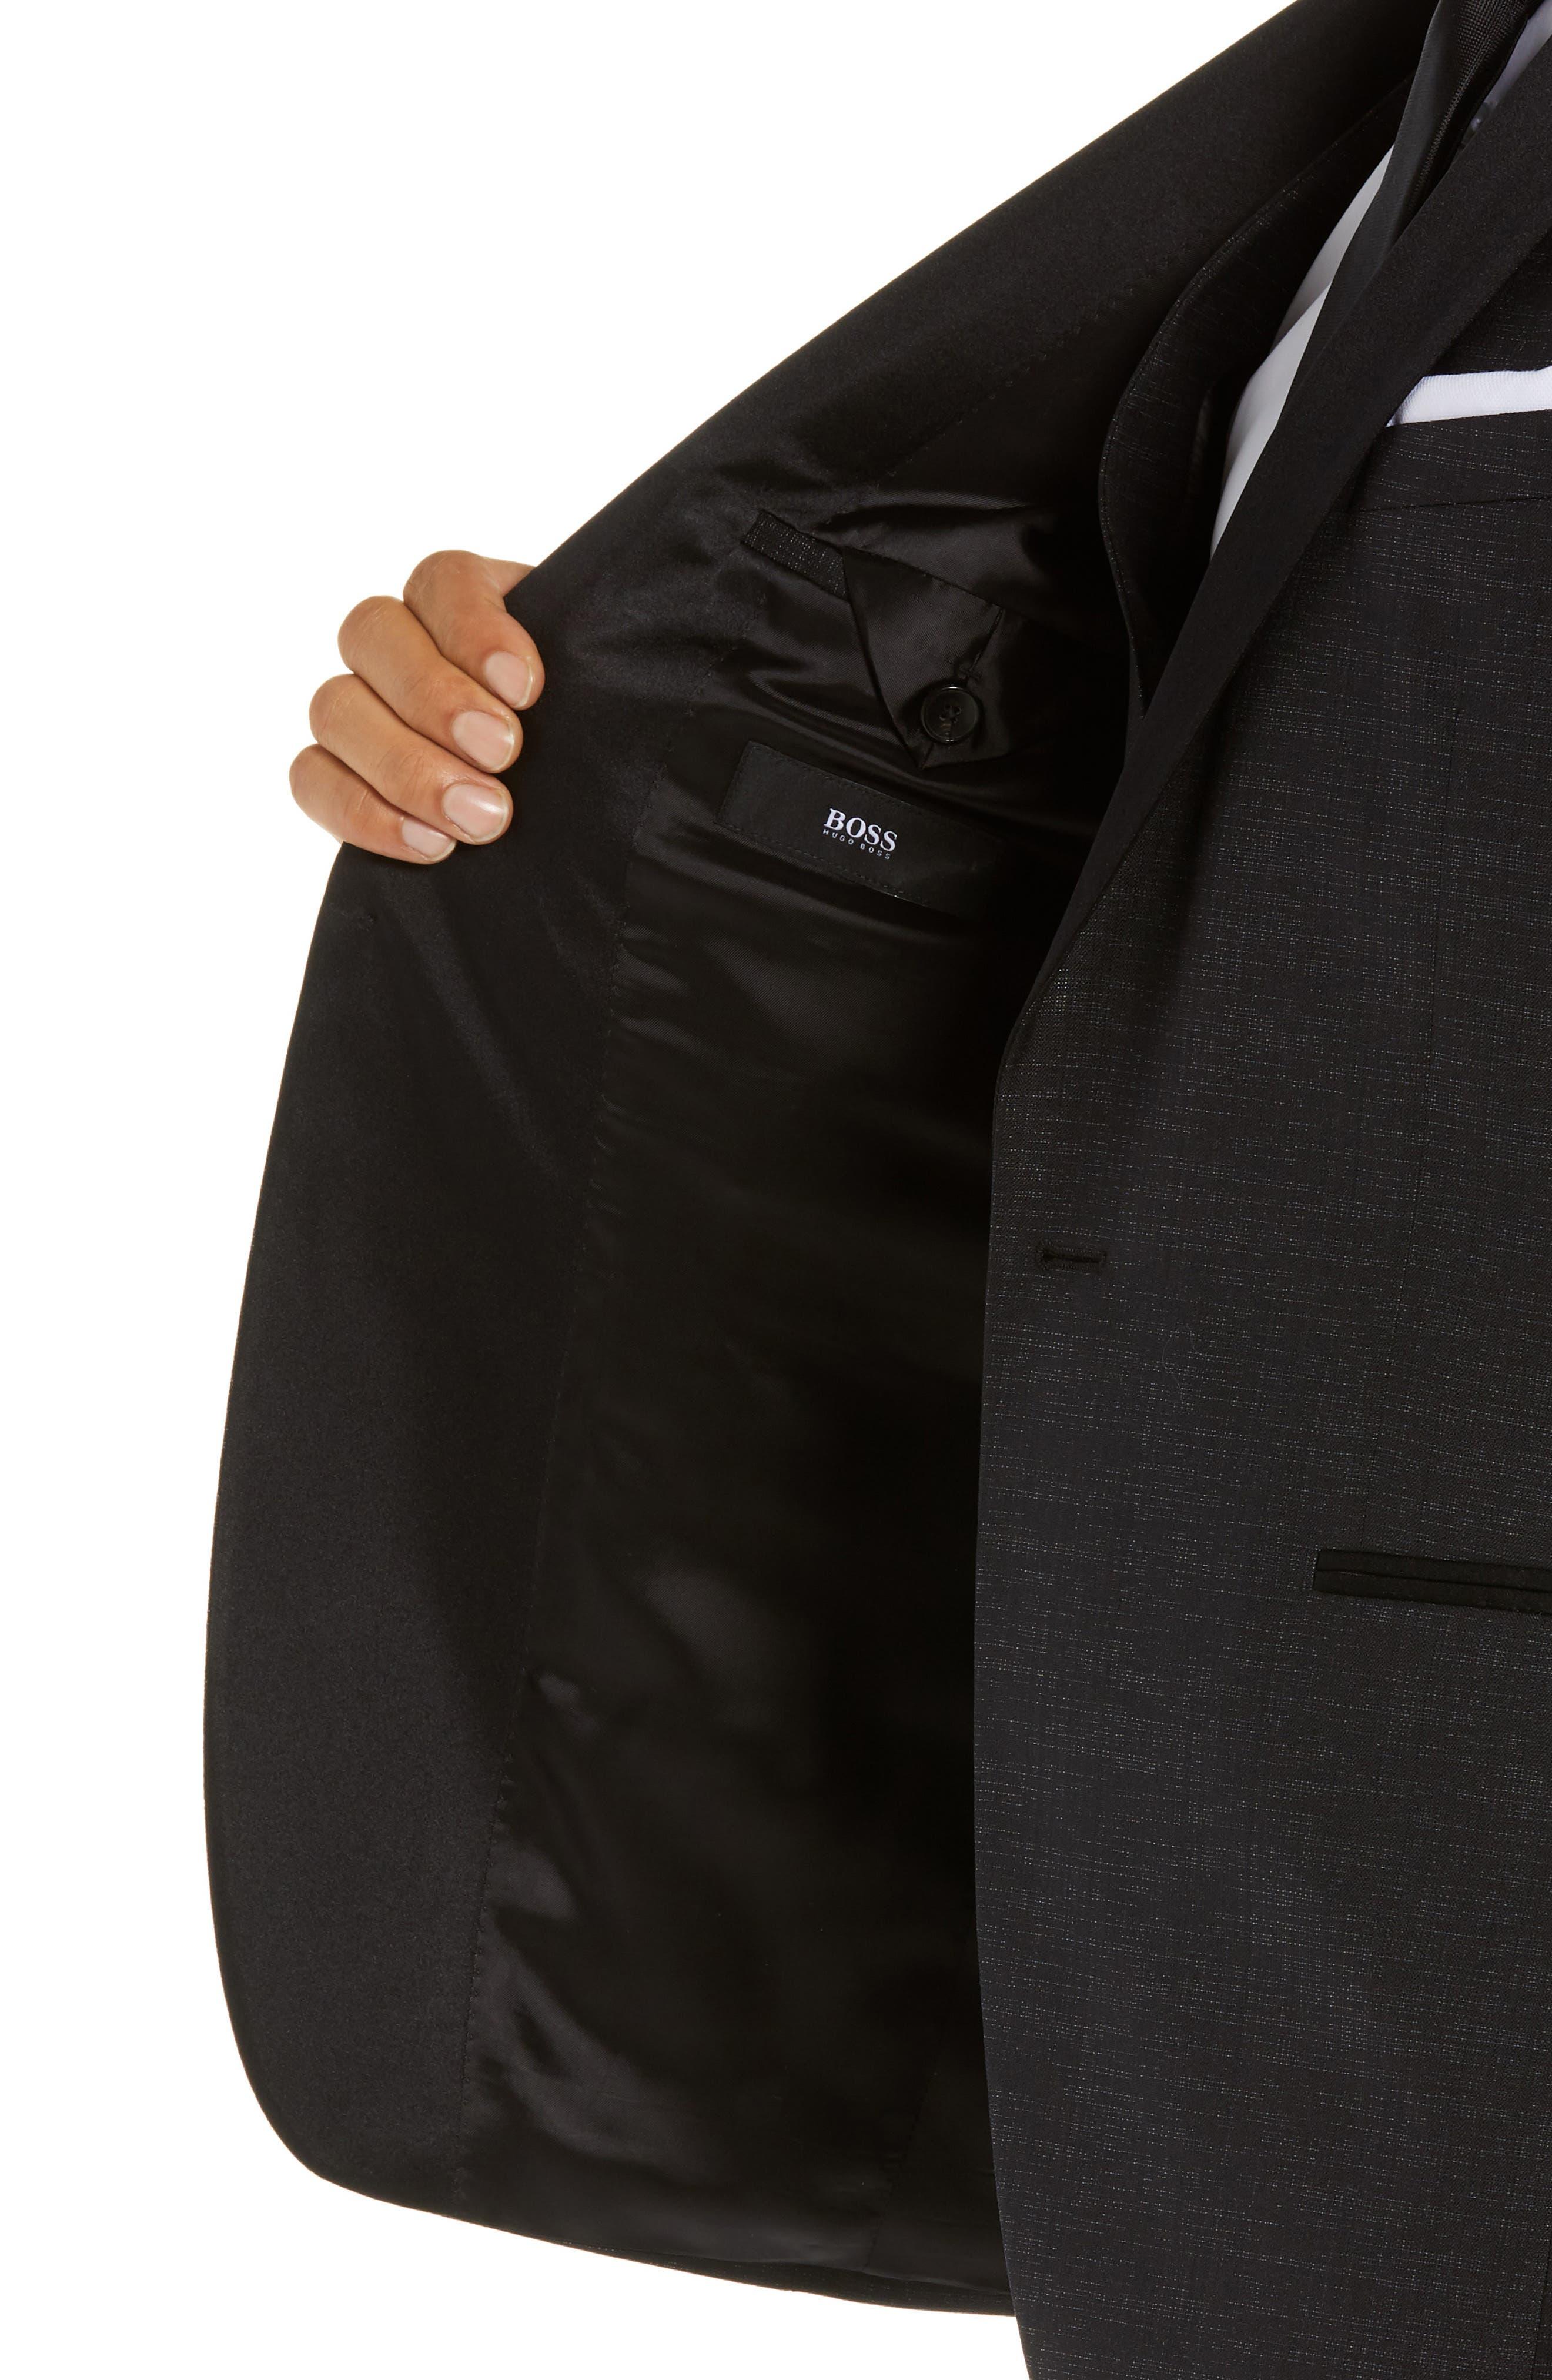 BOSS,                             Rendal/Wilden Slim Fit Three-Piece Tuxedo,                             Alternate thumbnail 4, color,                             BLACK